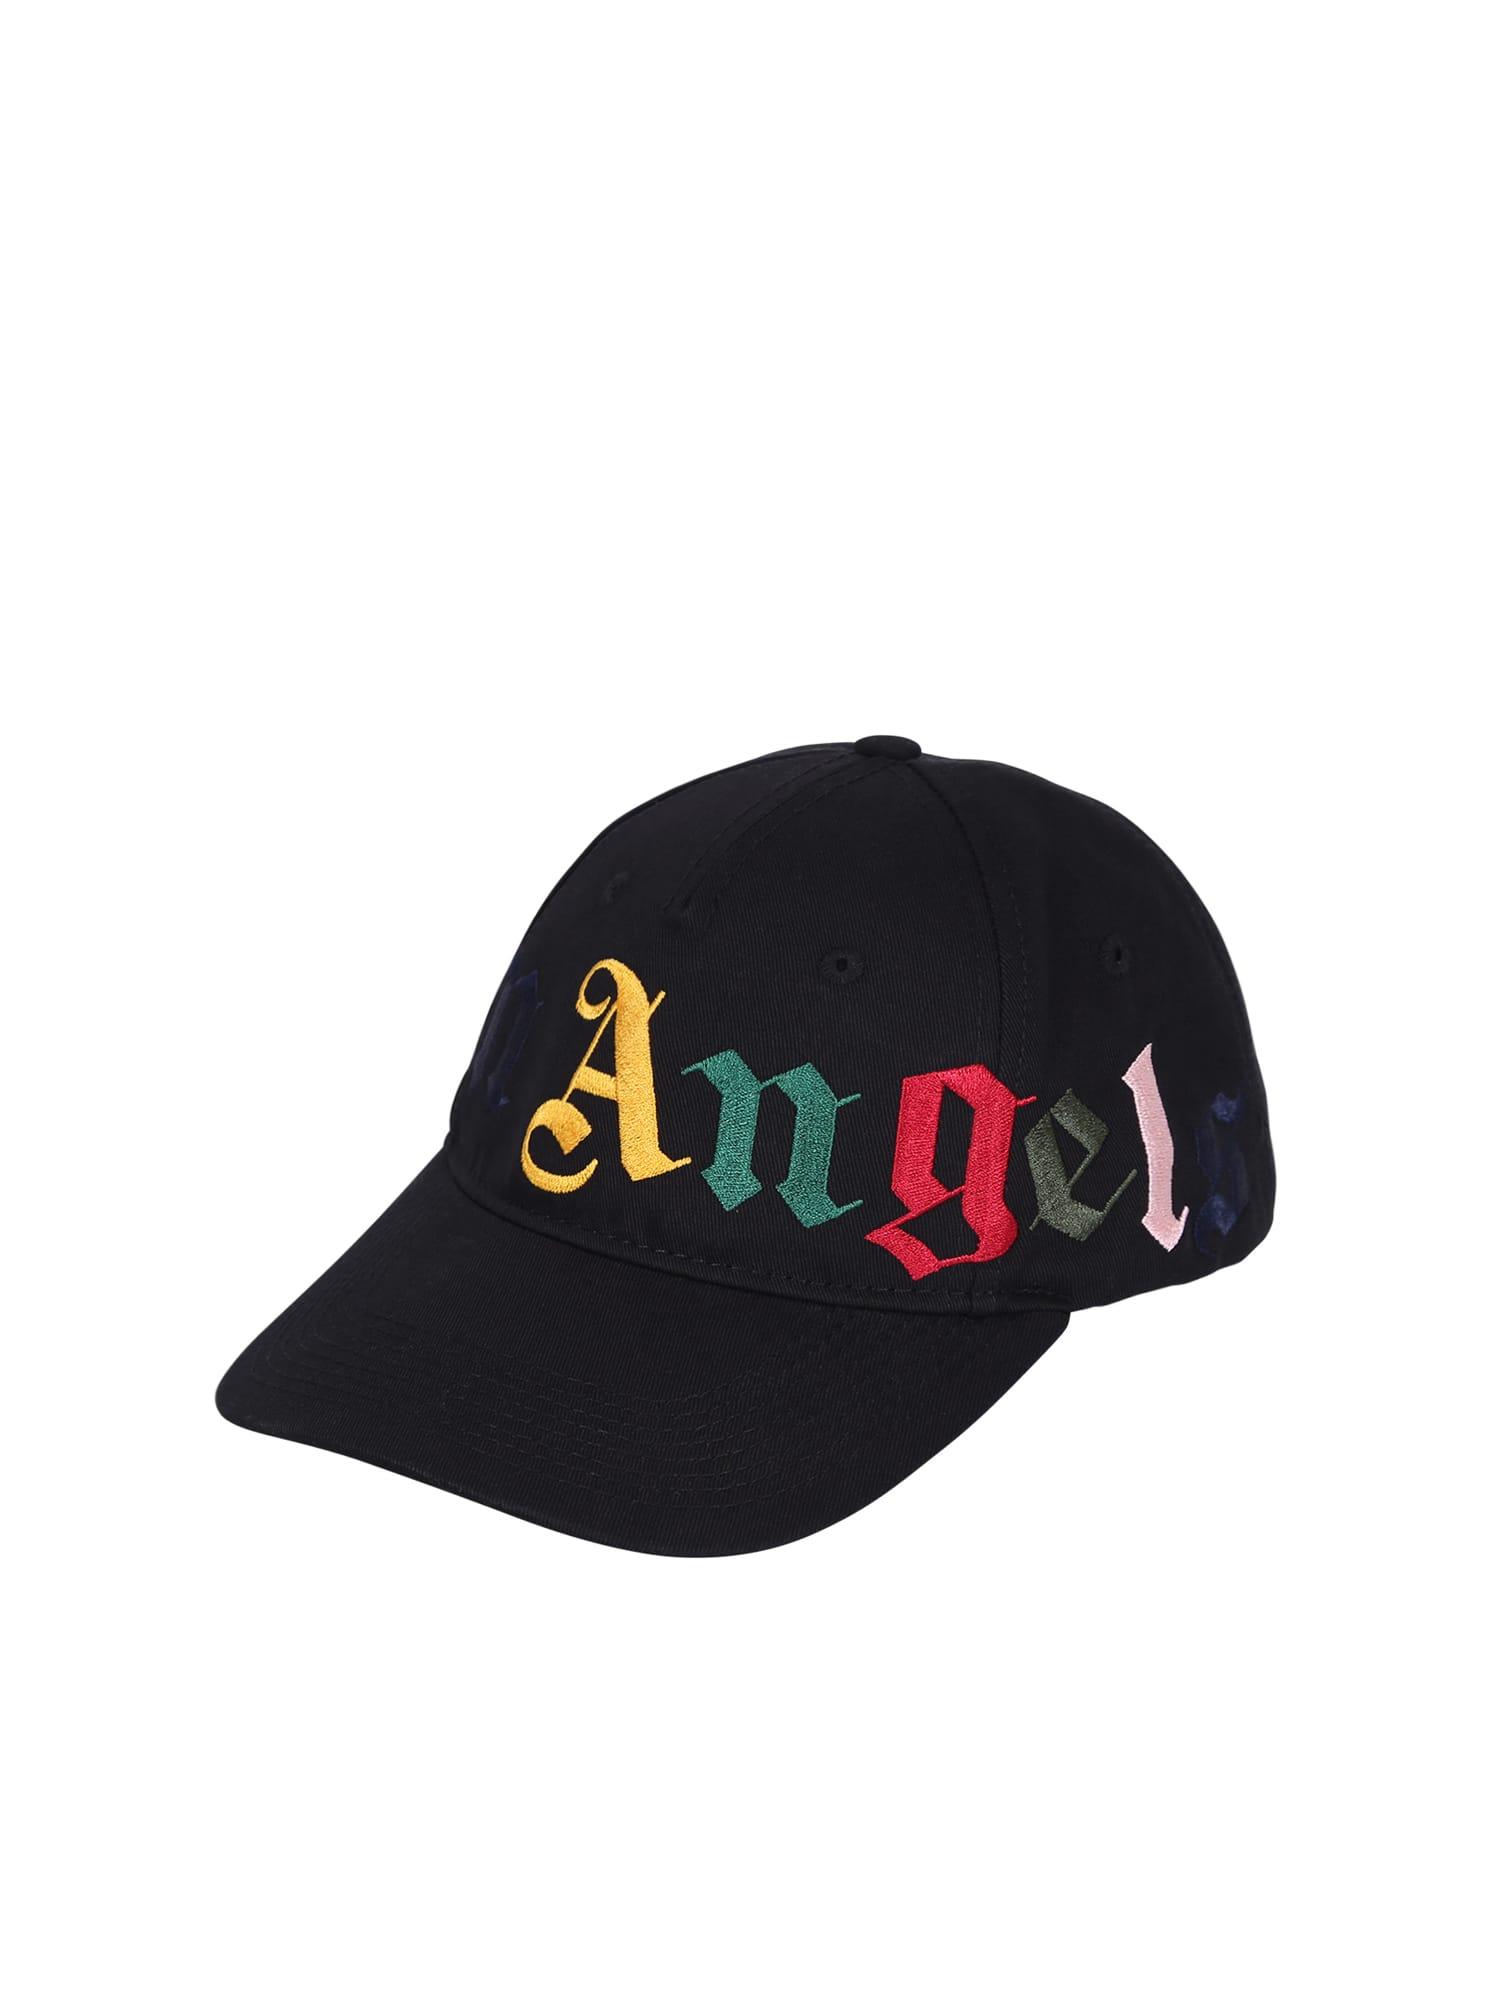 Palm Angels Branded Baseball Hat In Black